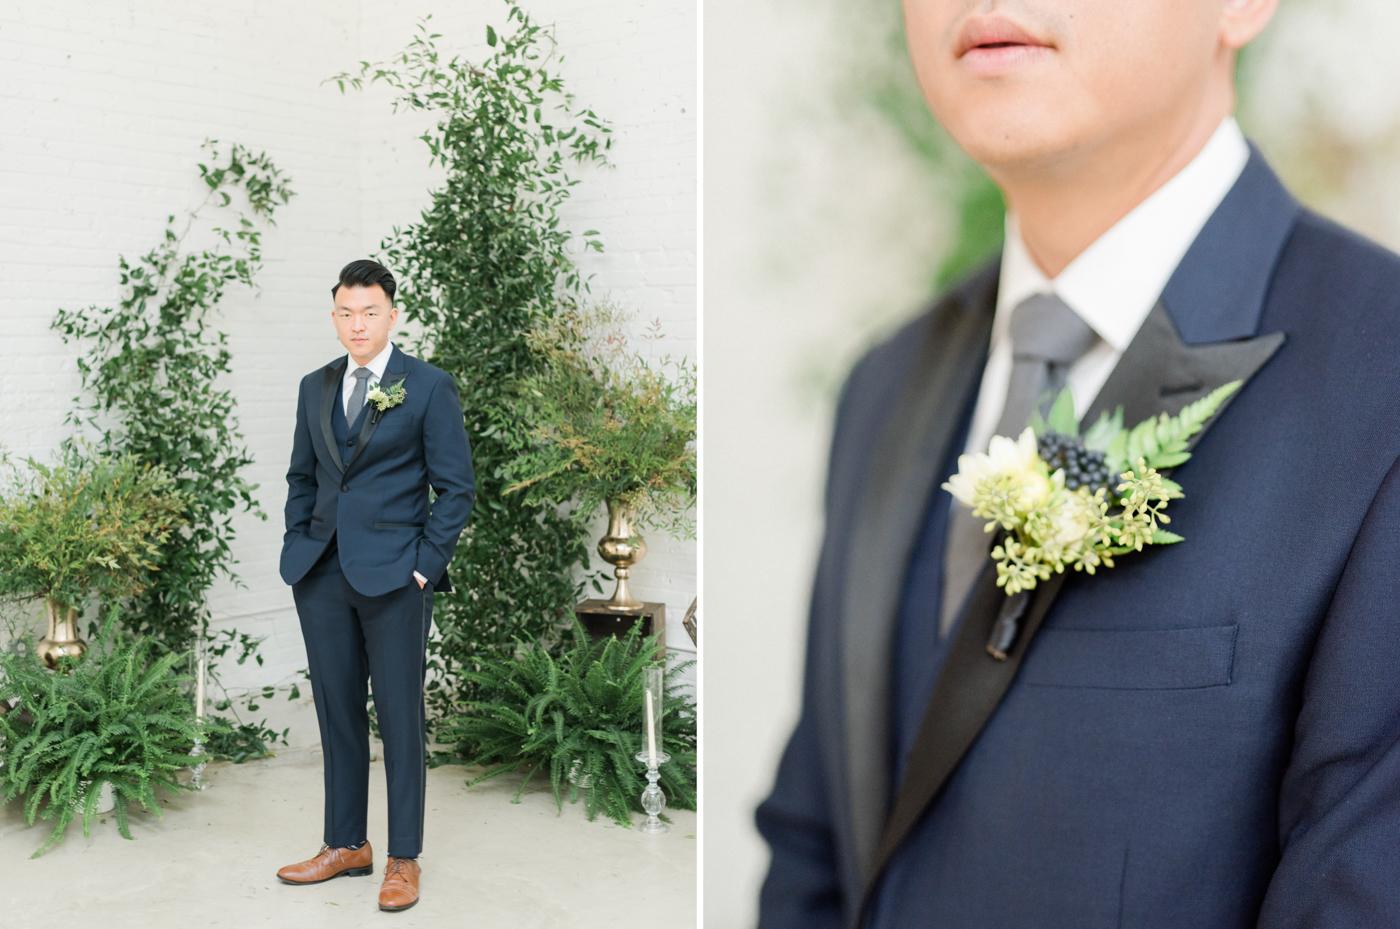 Modern_Wedding_HNYPT_Honeypot_LA_Photographer_Los_Angeles-26.jpg